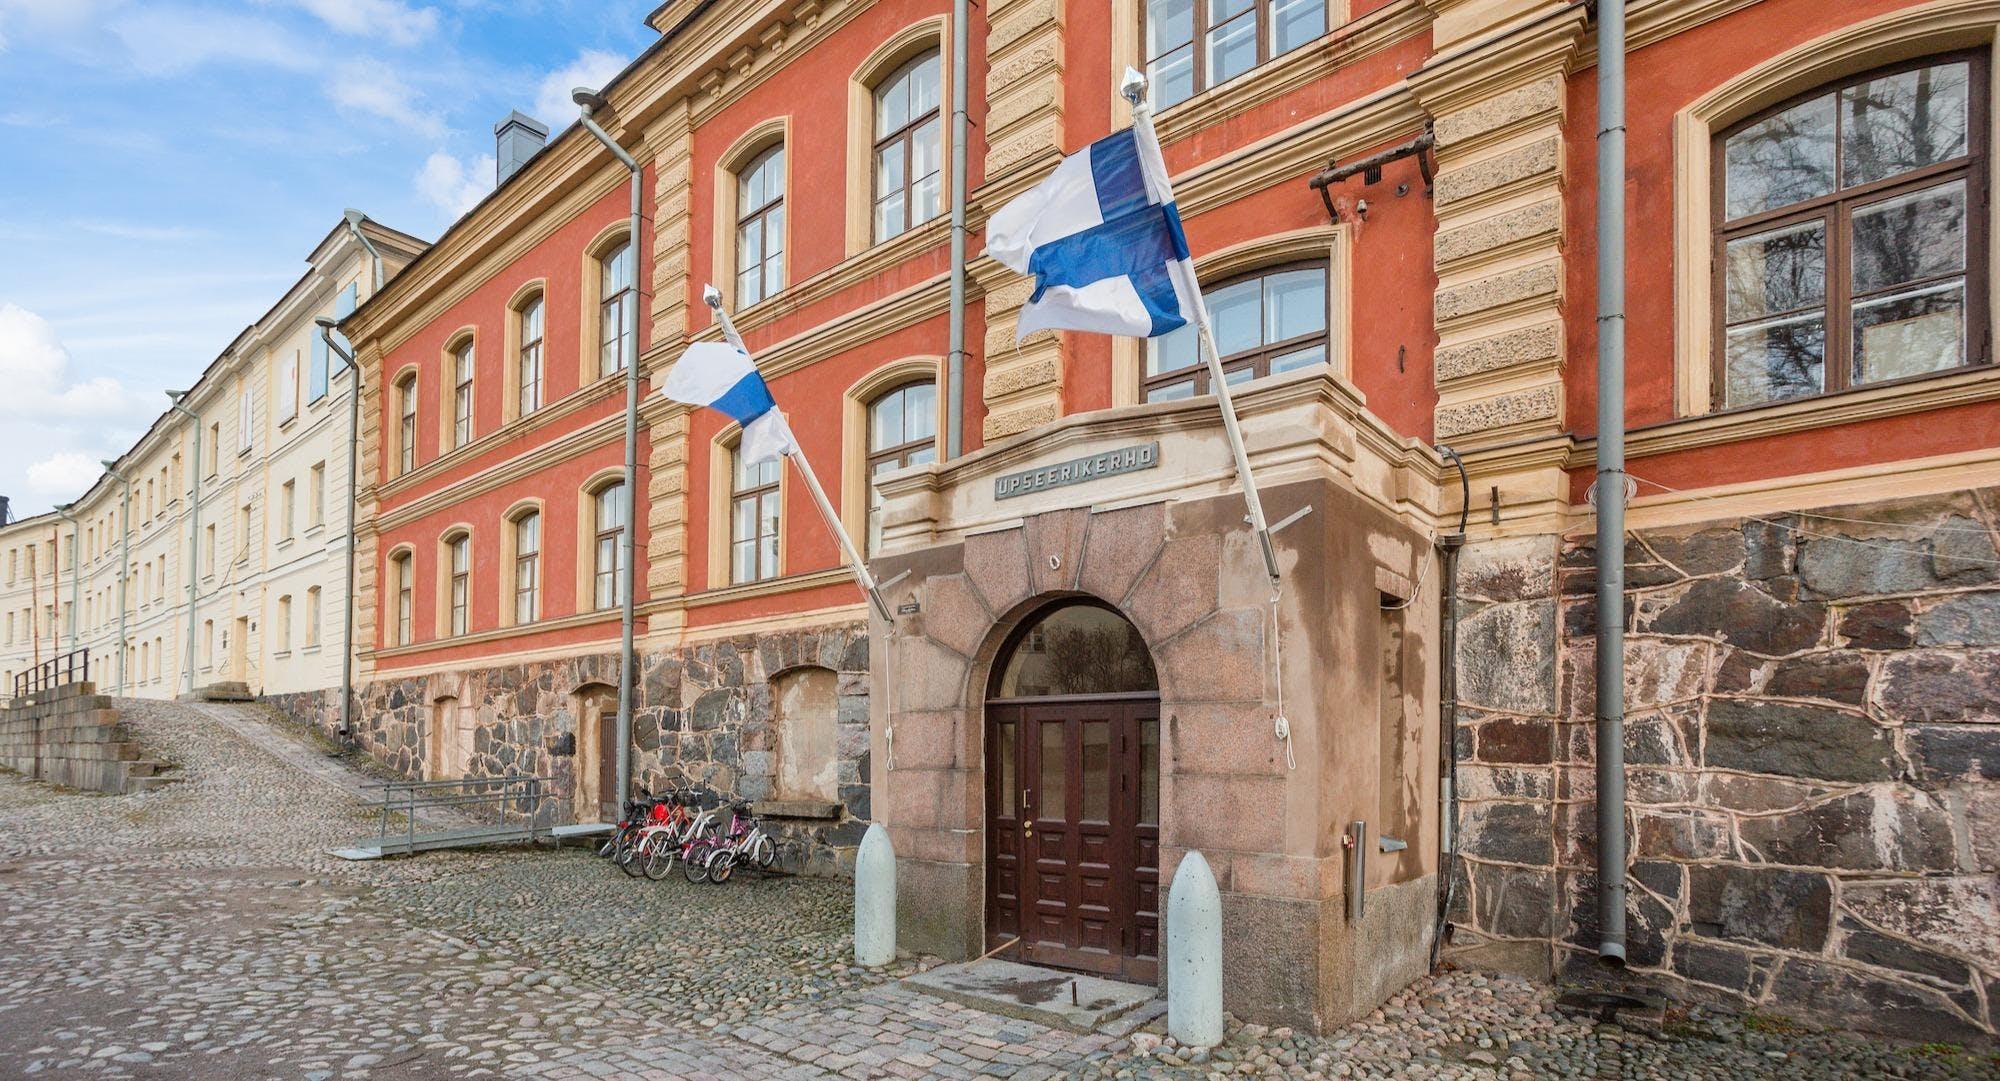 Suomenlinnan Upseerikerho Helsinki image 1